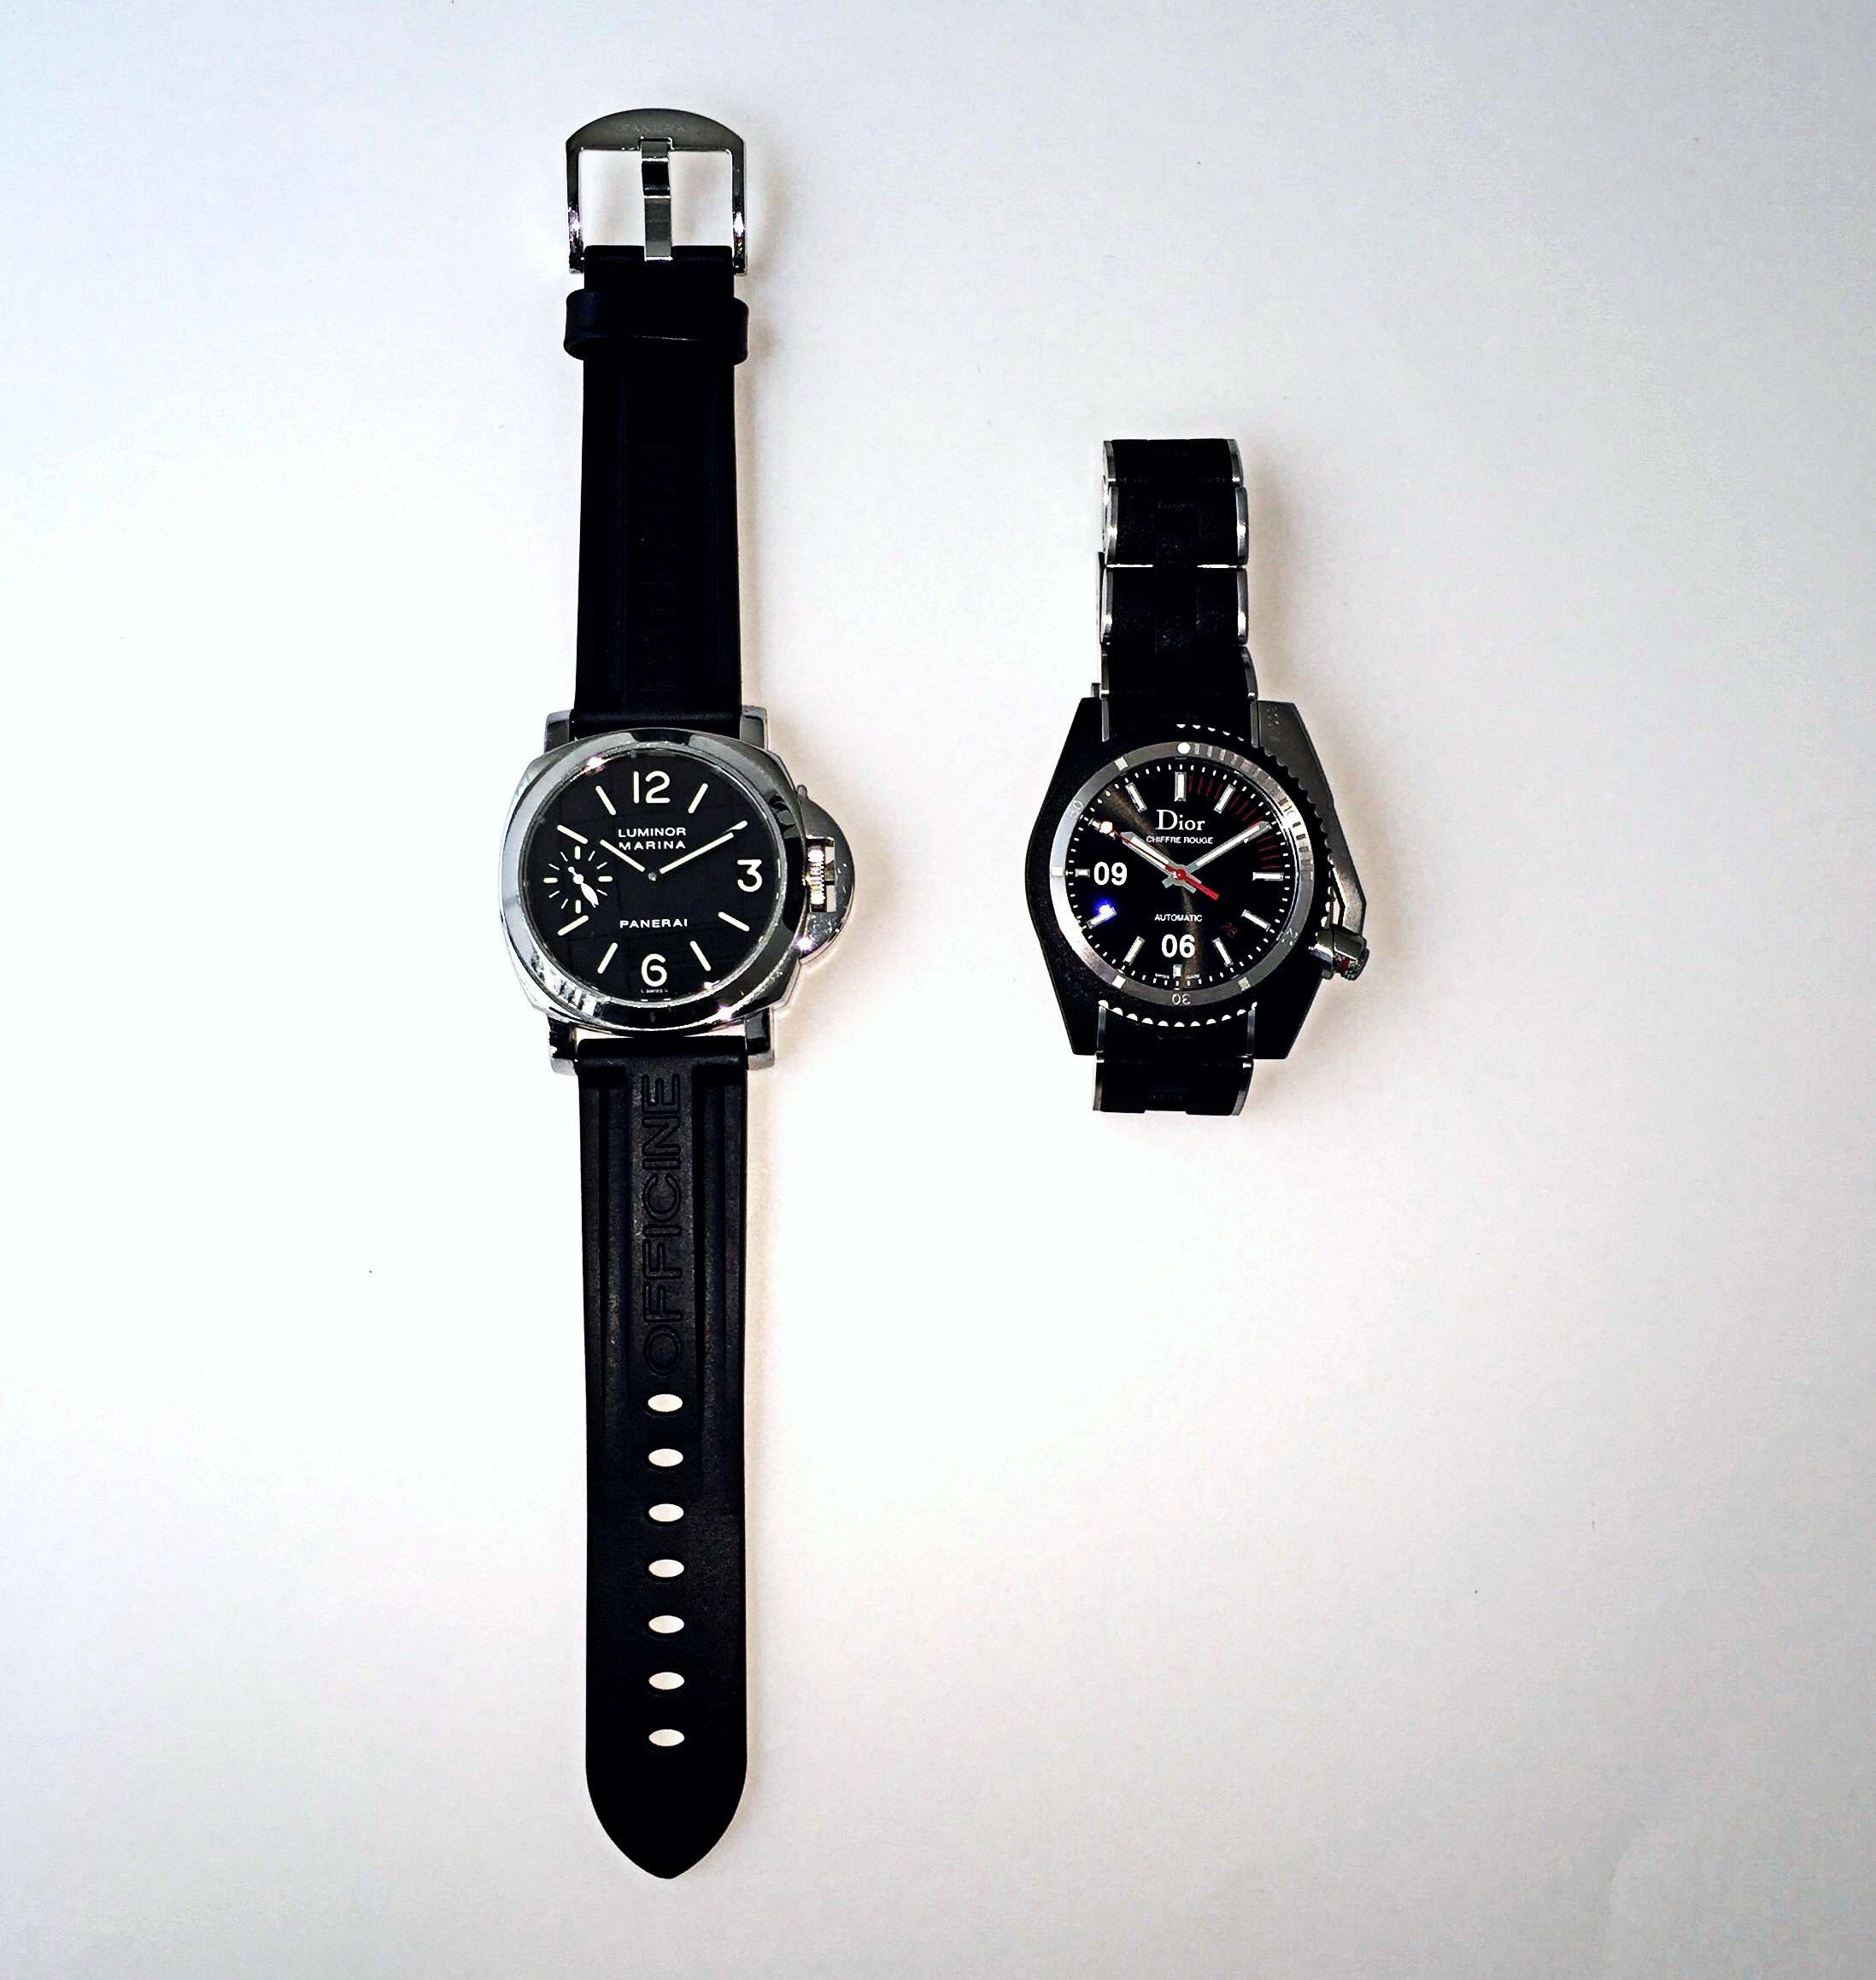 1a79465aadc8 黒い時計と『黒い時計の旅』 - 編集長山崎の「ファッション横滑り」 | SPUR